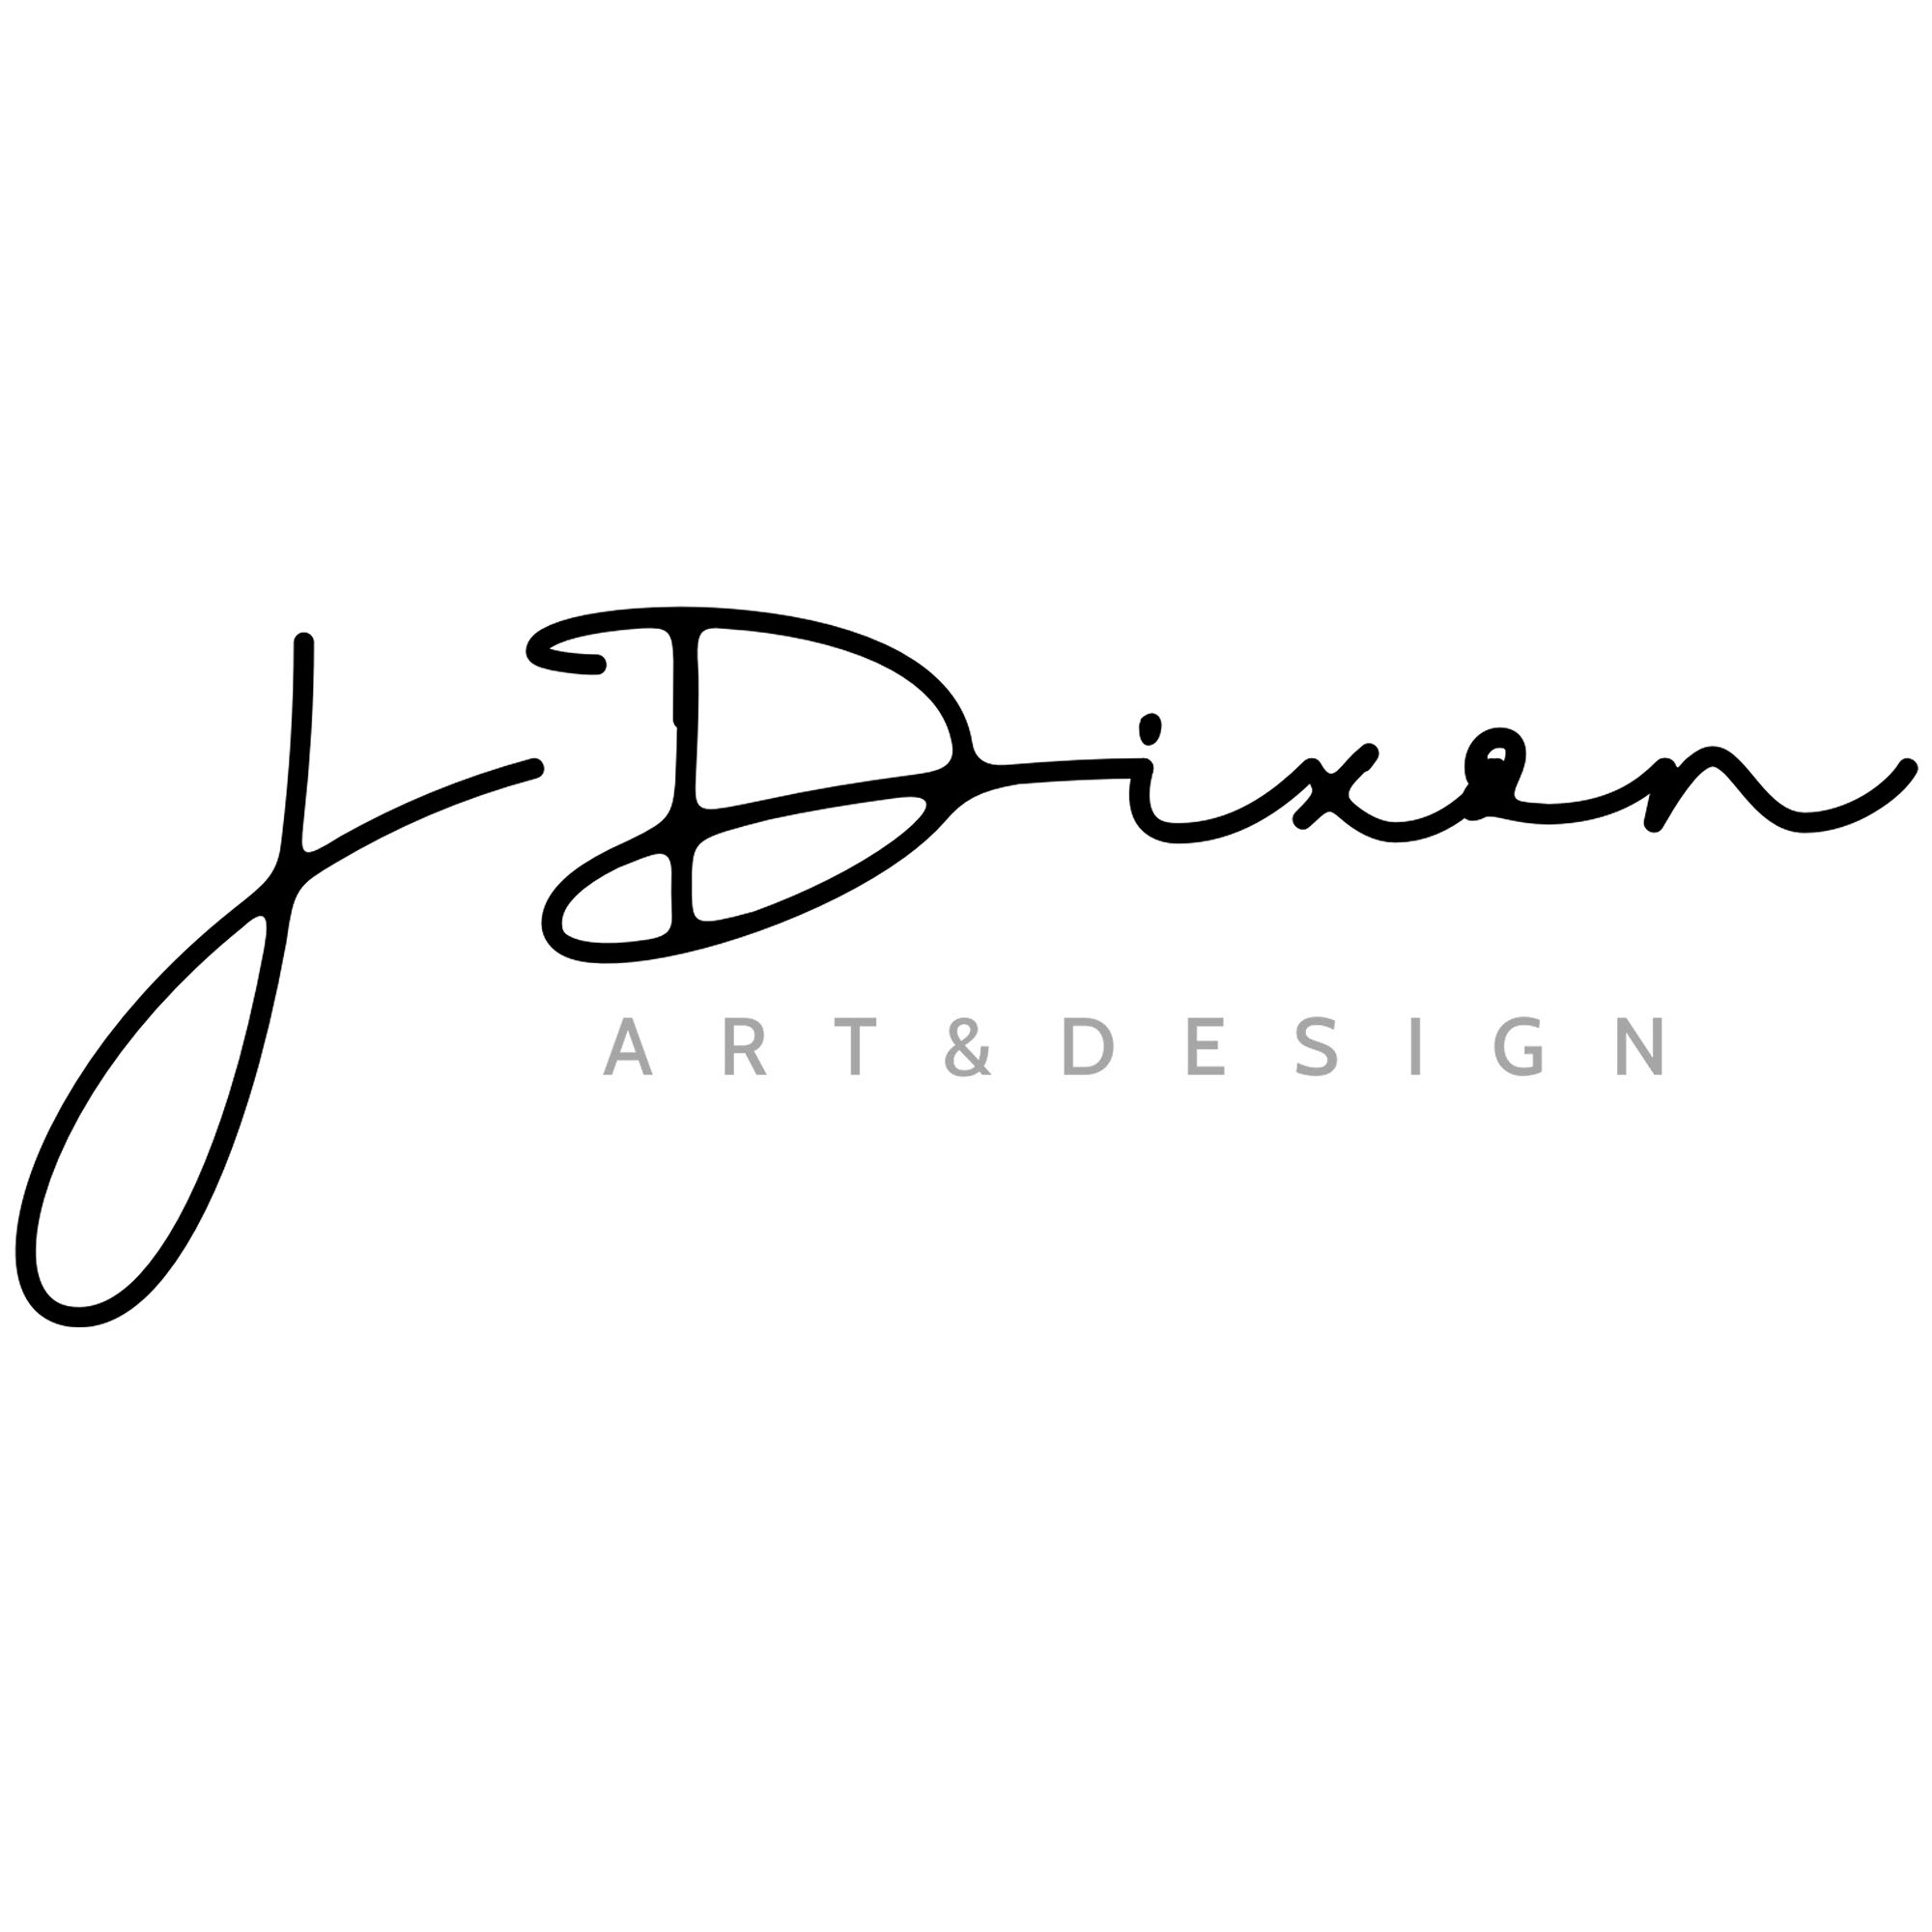 J. Dixon Art & Design